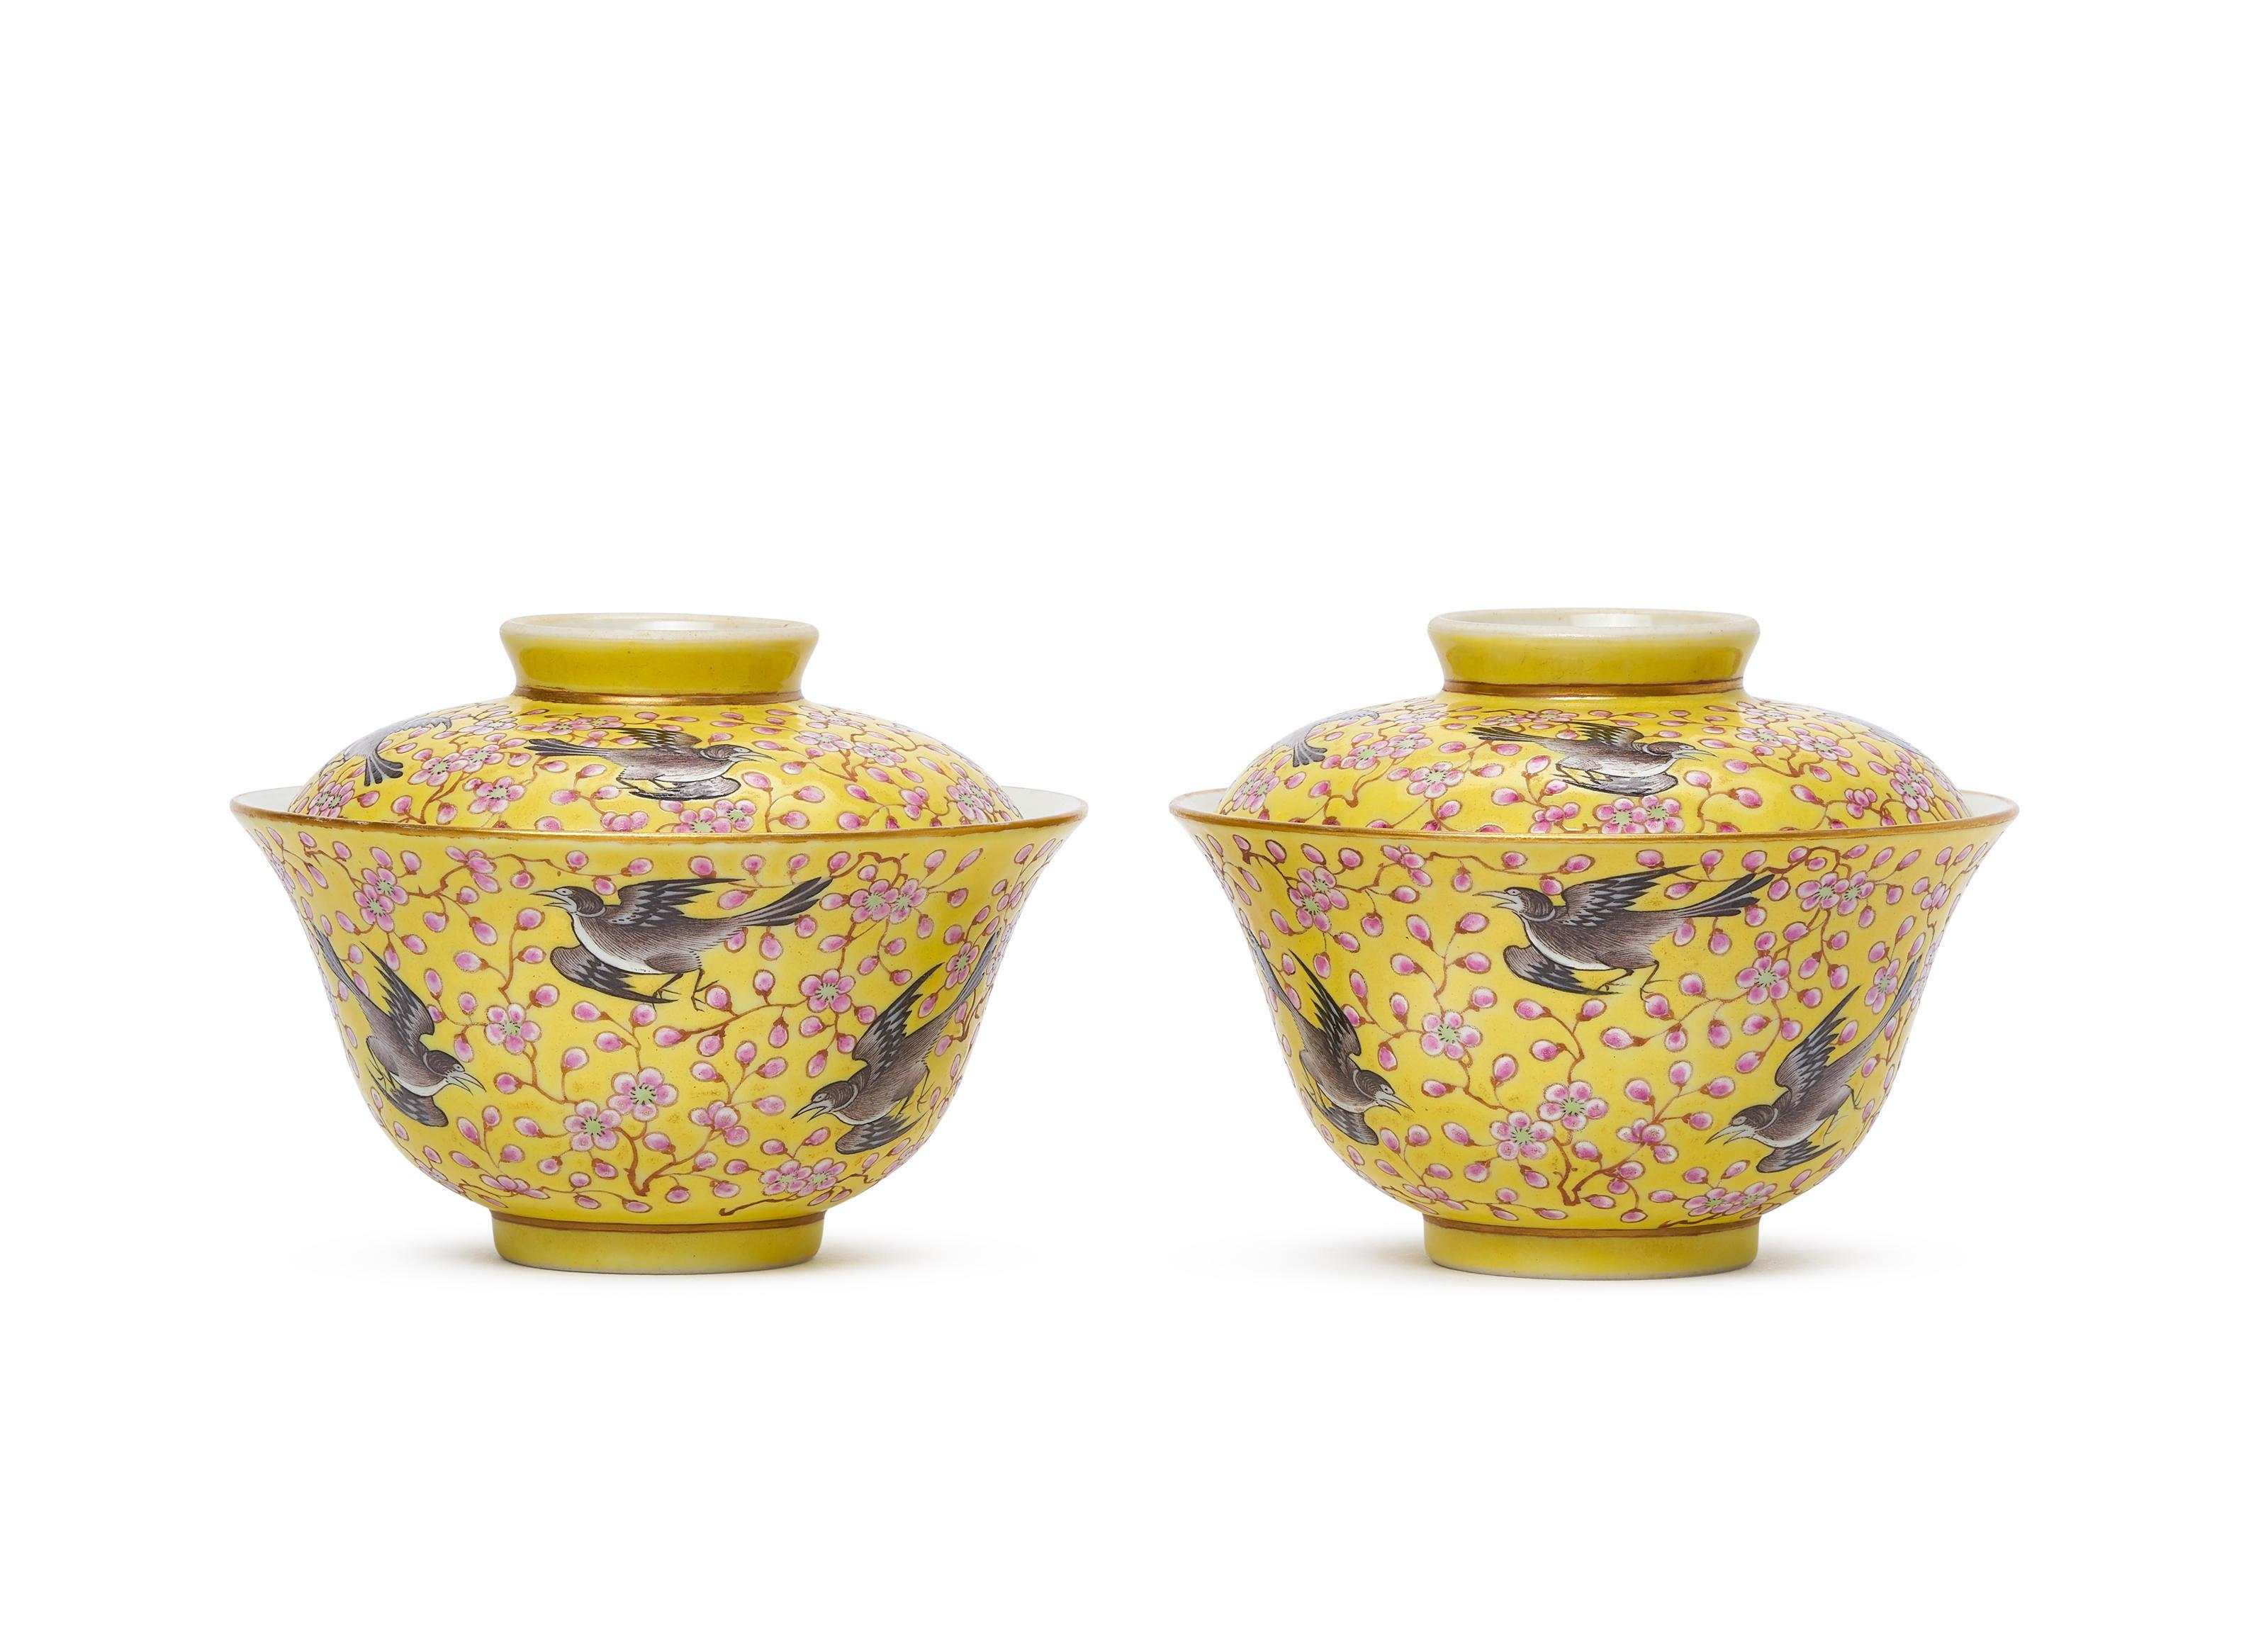 Chinese Collectible Cloisonne Enamel Copper Melon Kettle Teapots Yellow H134 Less Expensive Collectibles Cloisonne